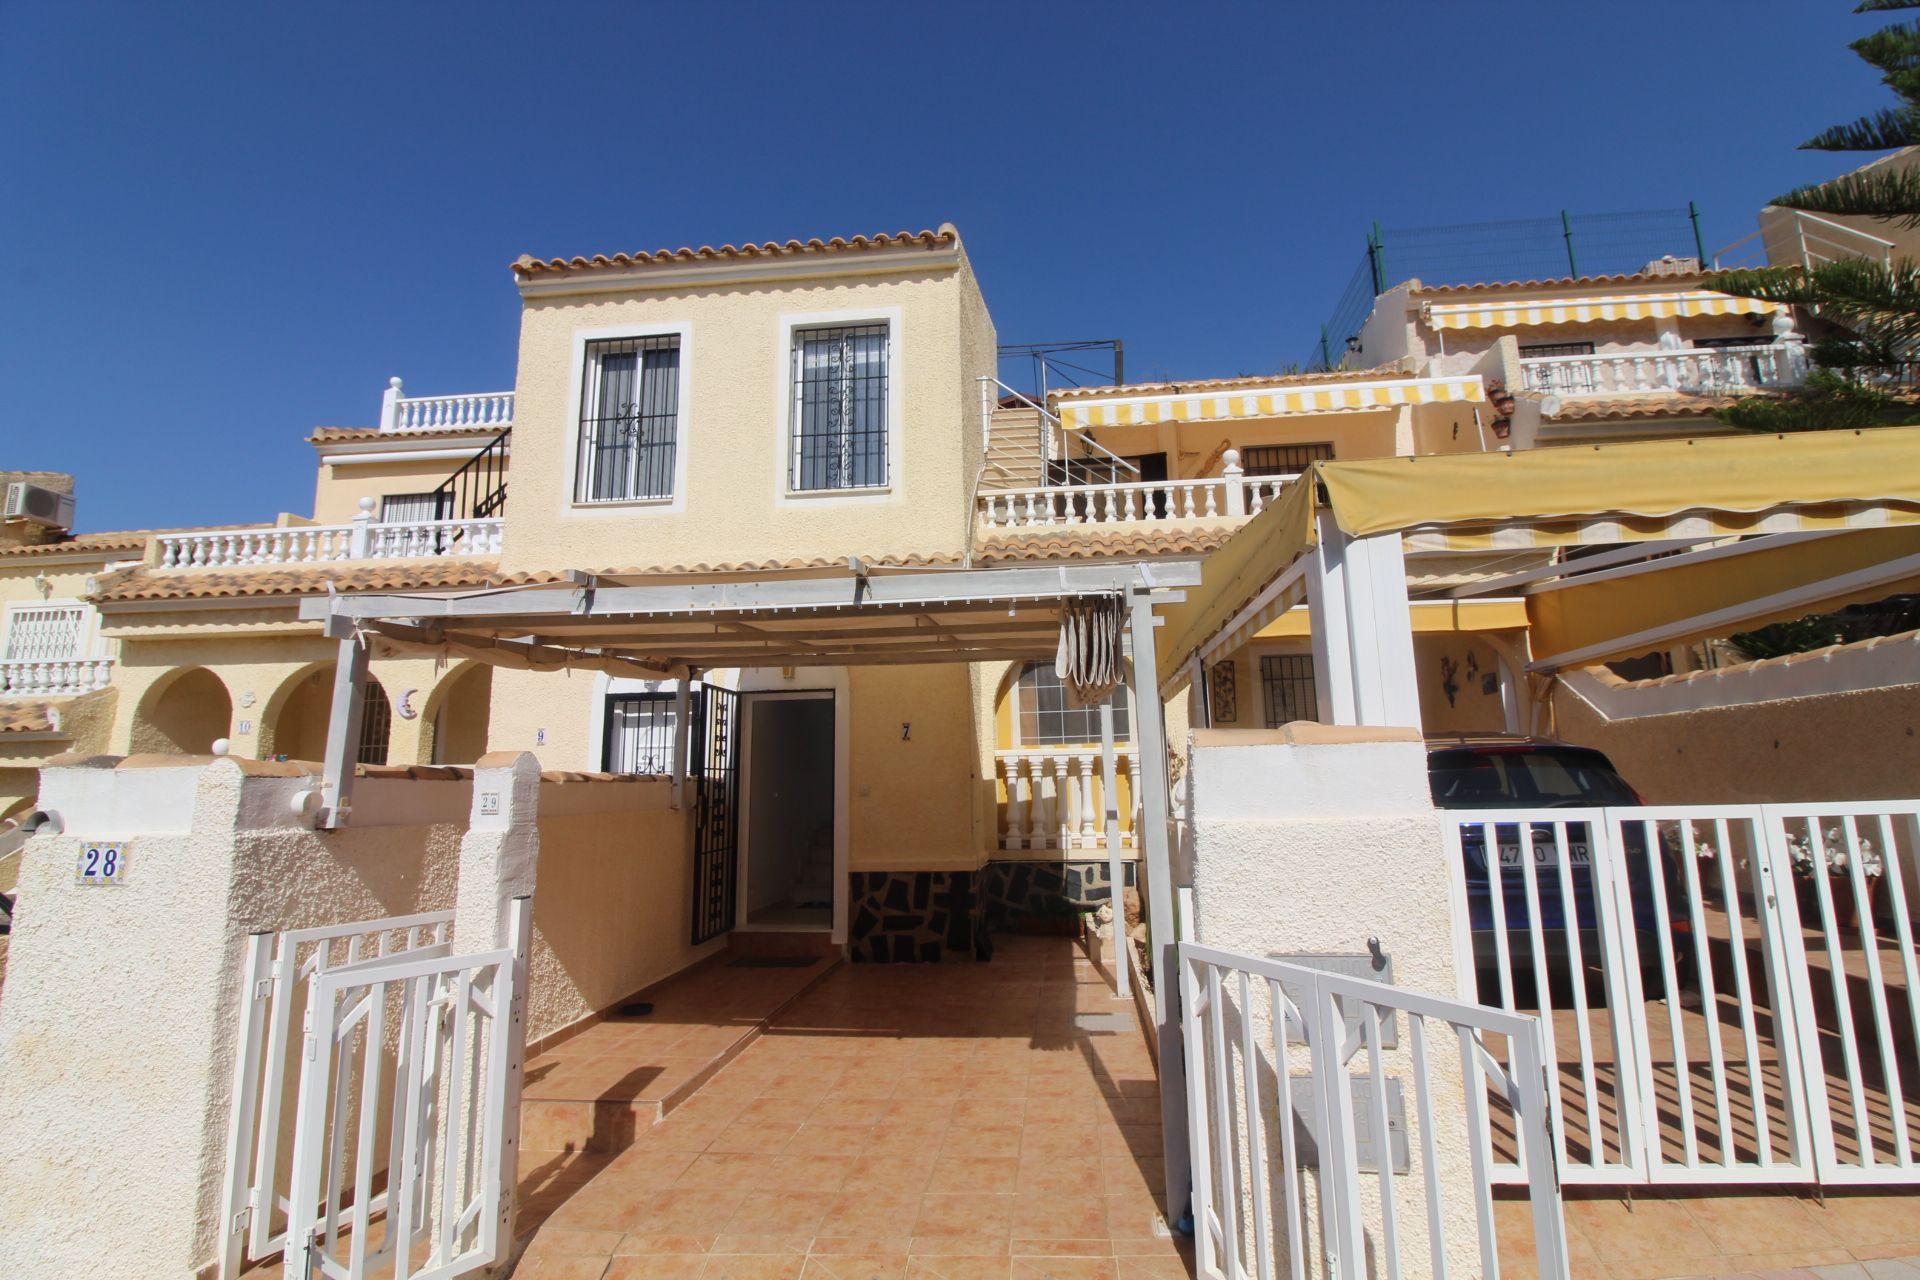 Duplex in Gran Alacant, Monte y Mar Zona Baja Gran Alacant, for rent